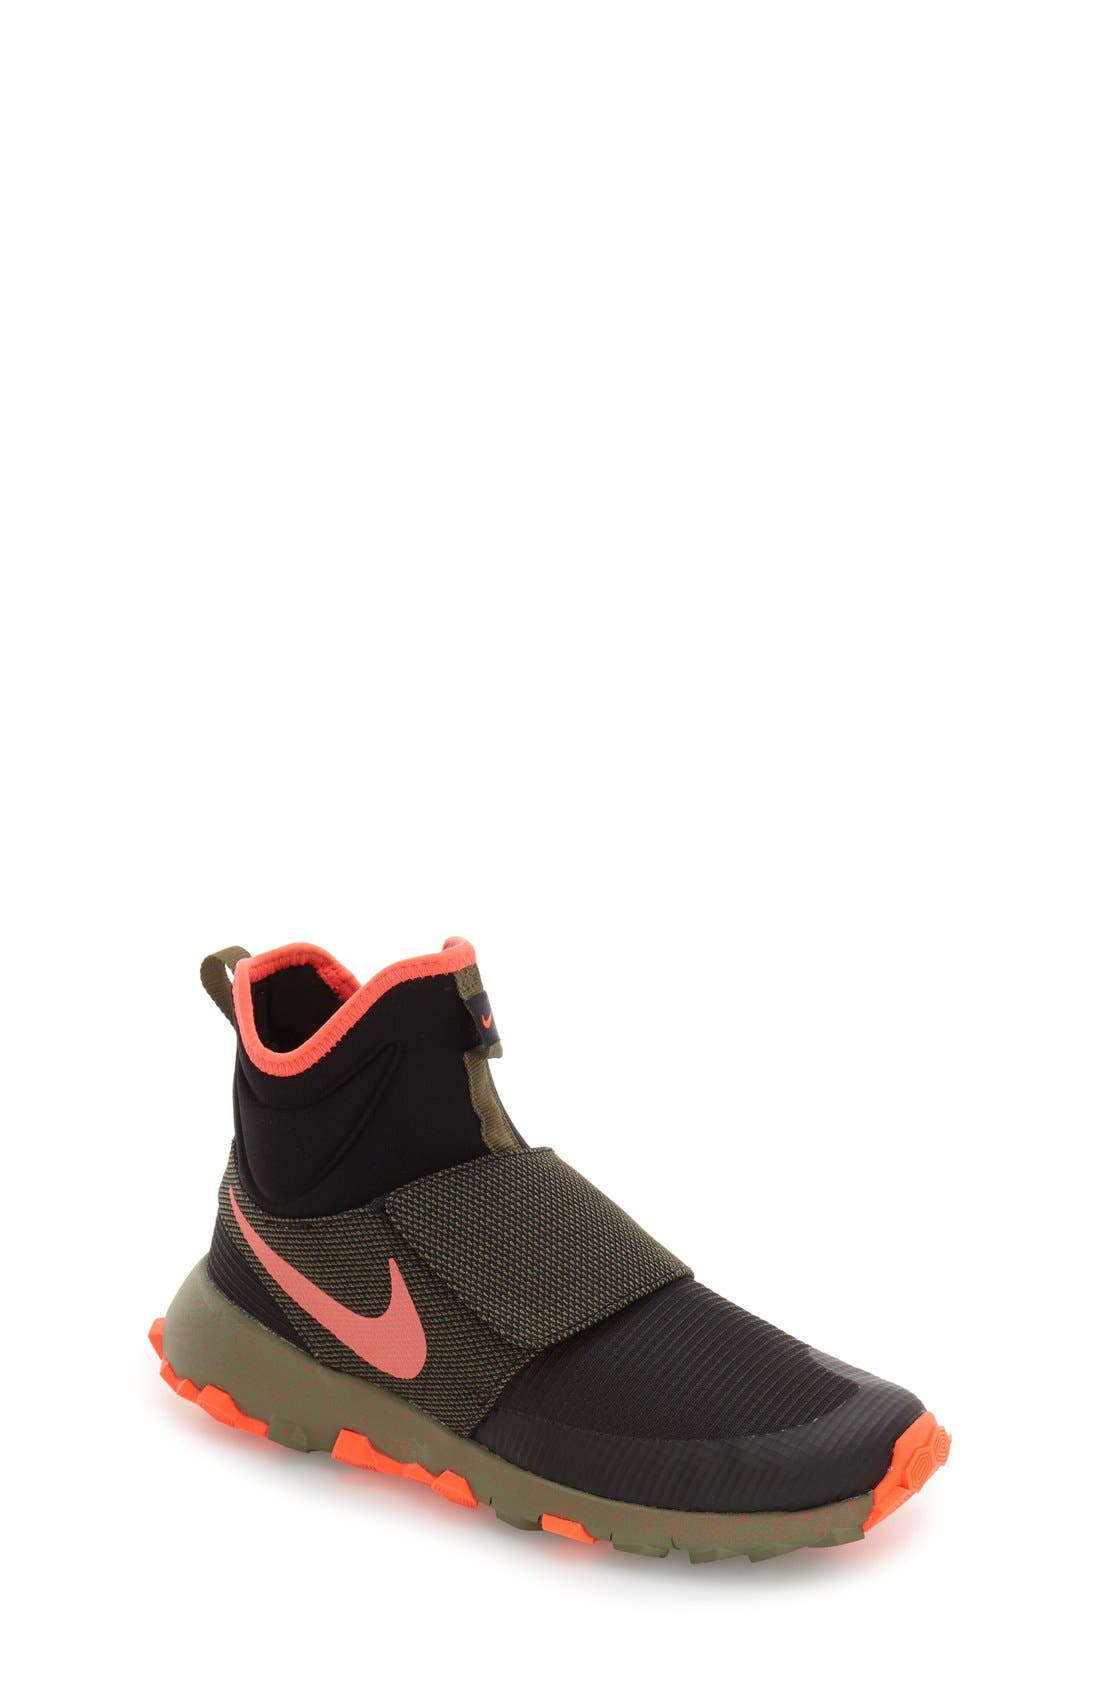 hot sale online a4a68 b9212 ... czech nike roshe mid winter stamma youth boots db29d 7f498 wholesale  nike free run 2 zalando ...